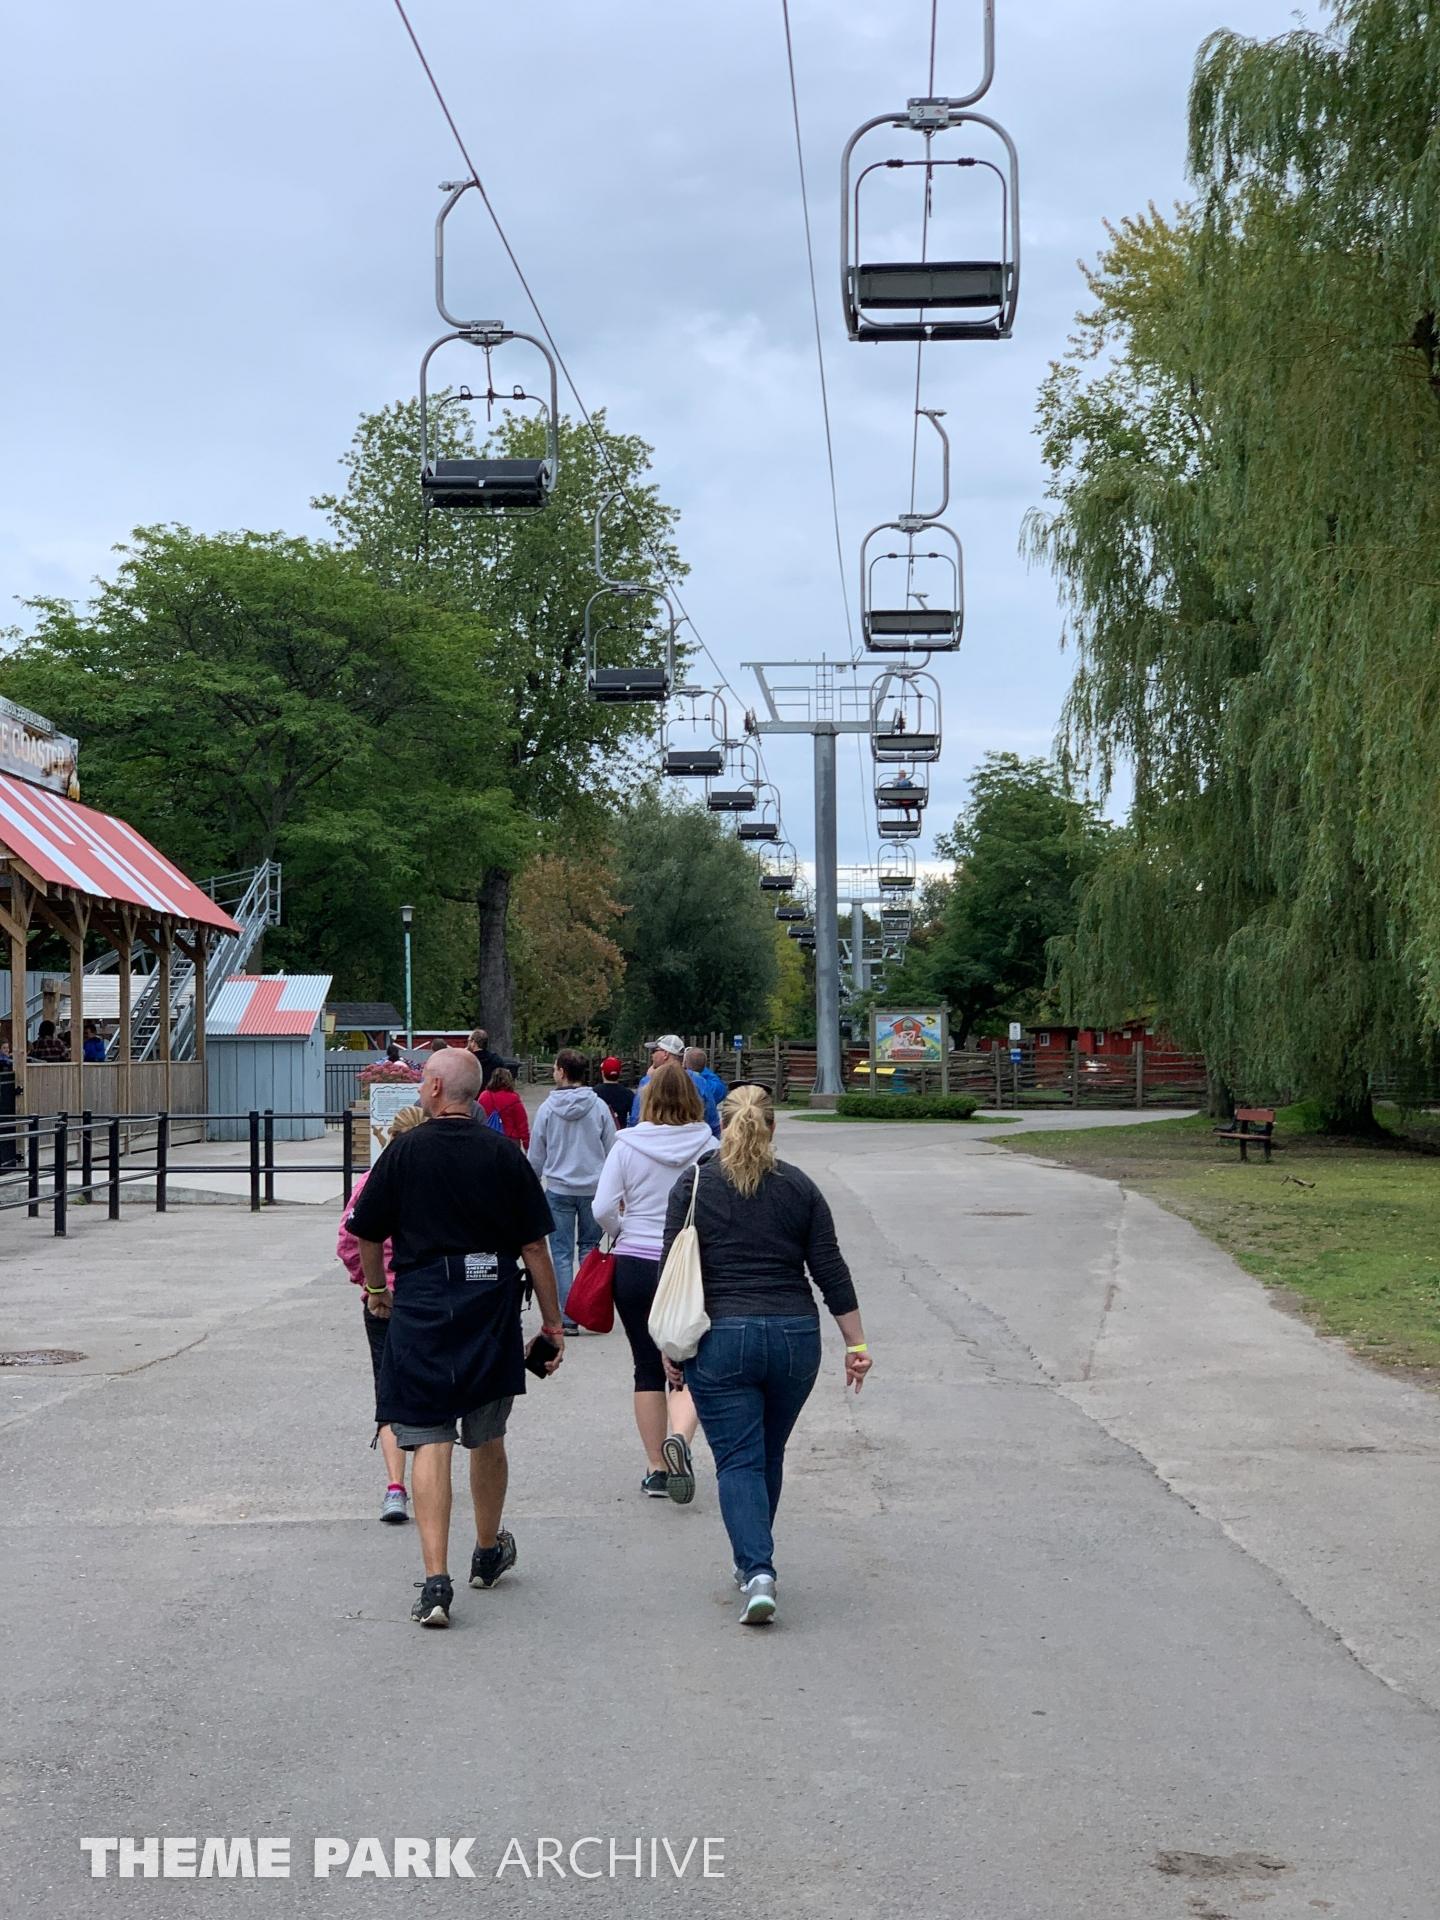 Sky Ride at Centreville Amusement Park